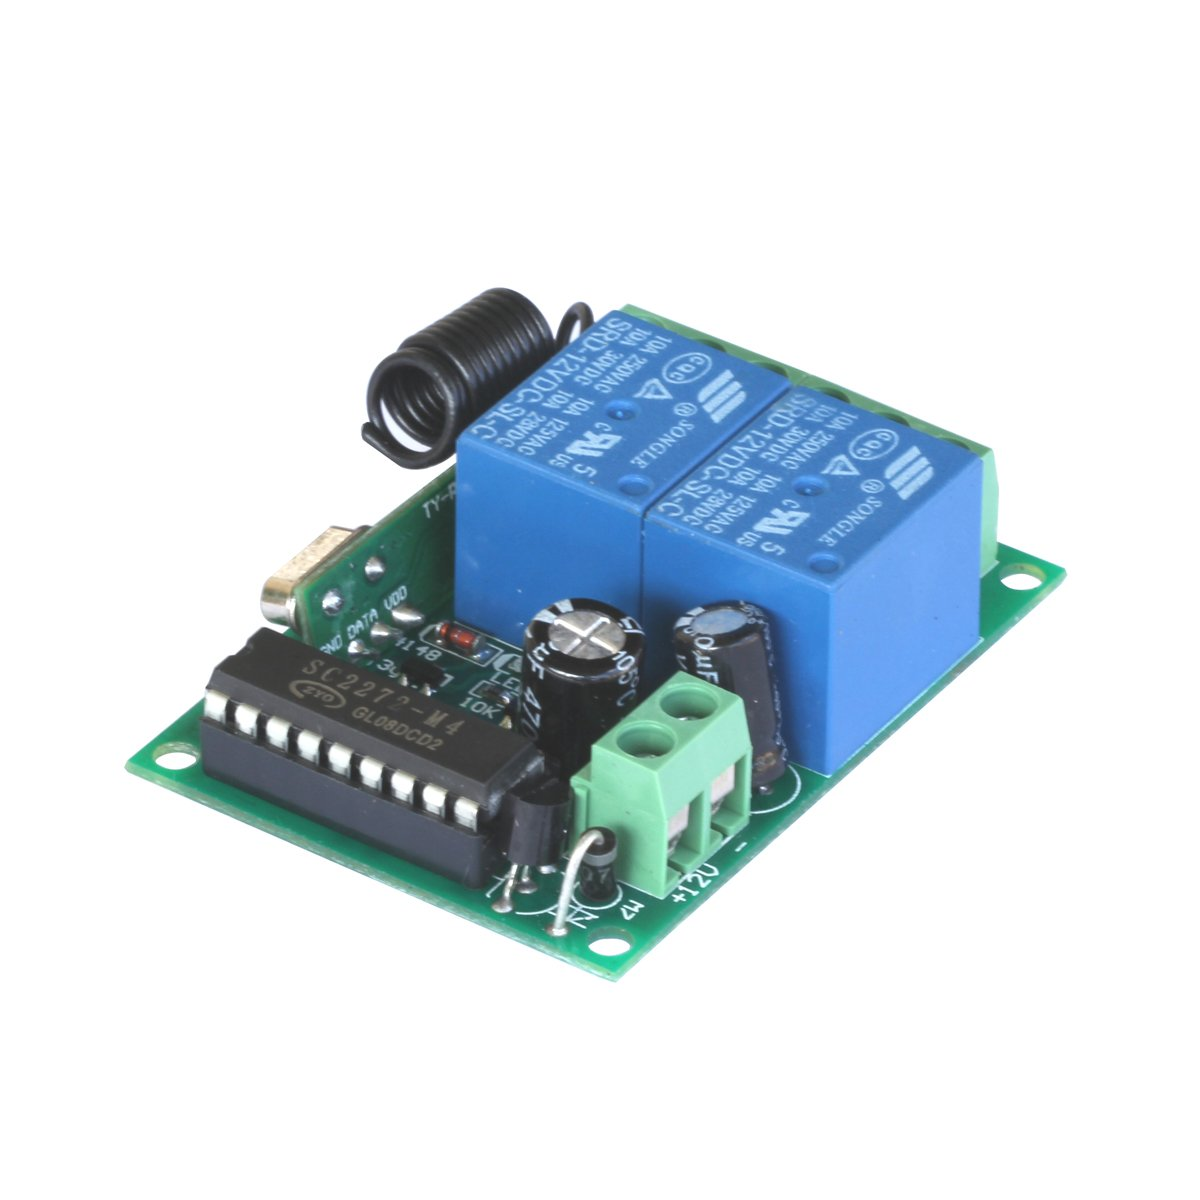 transmisor 12 V 10 A canal 2 LEORX colorfulbagsuk puerta garaje abridor interruptor de Control remoto inal/ámbrico